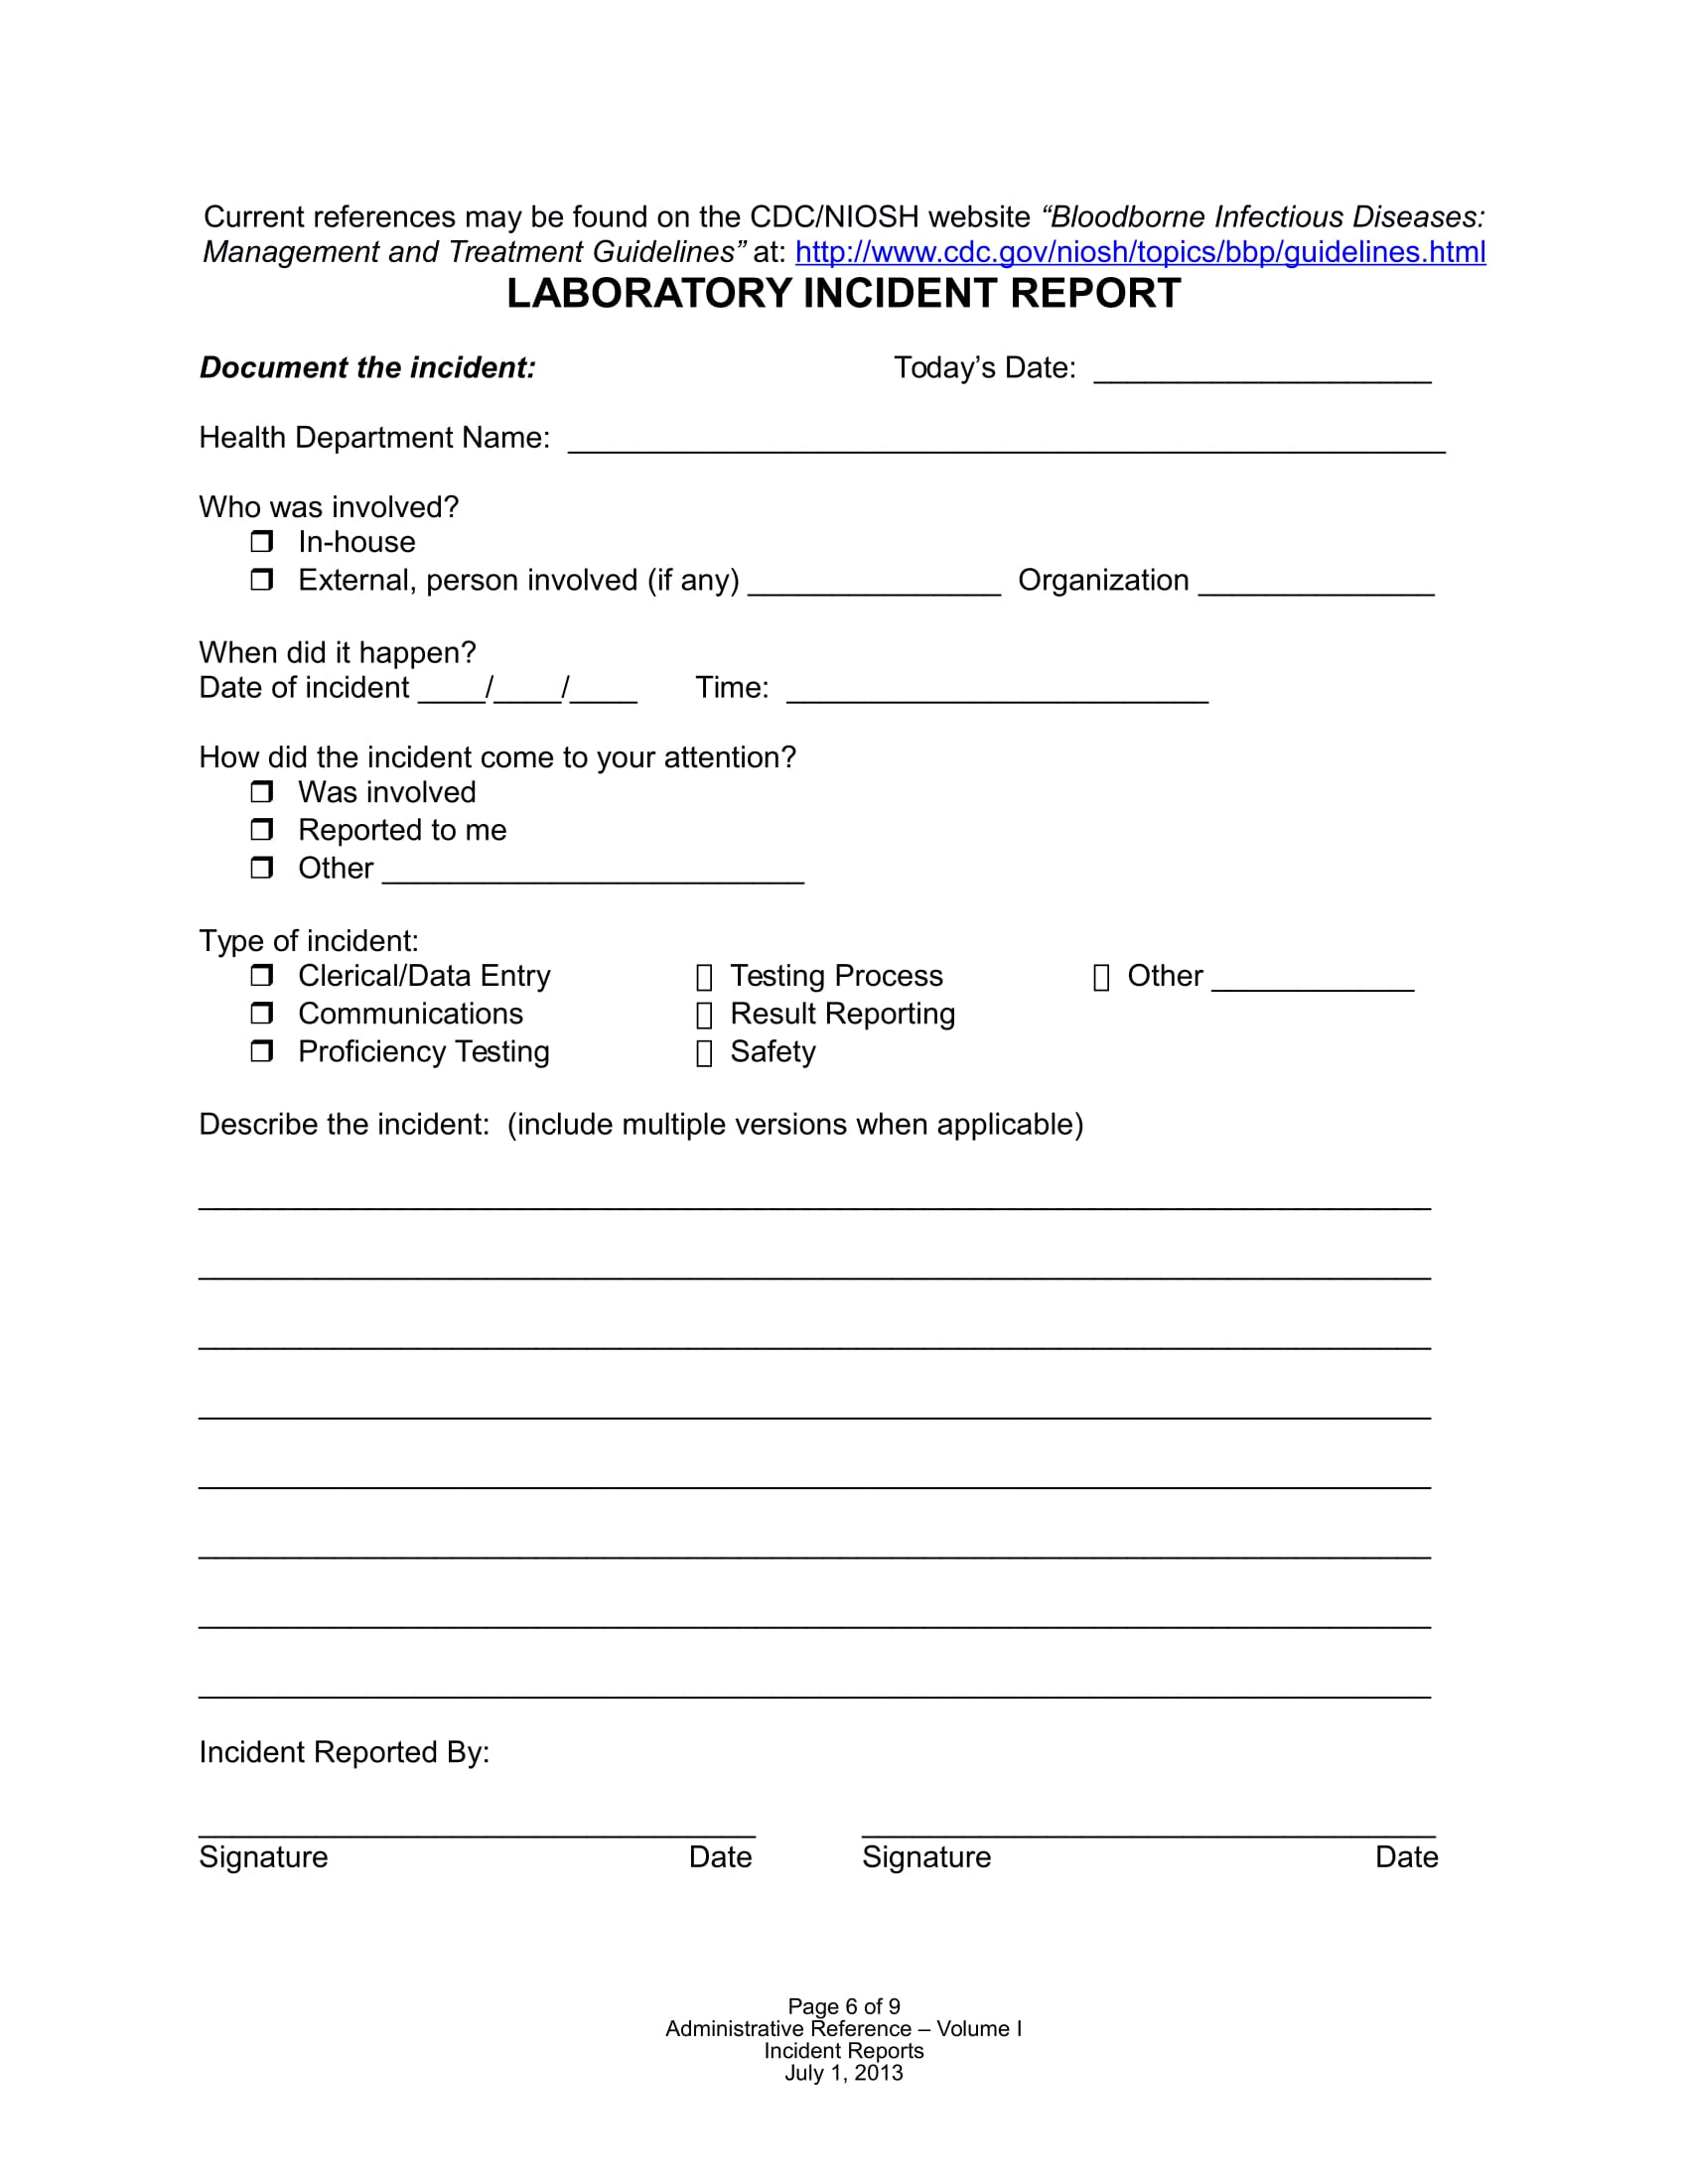 laboratory incident report form sample 07